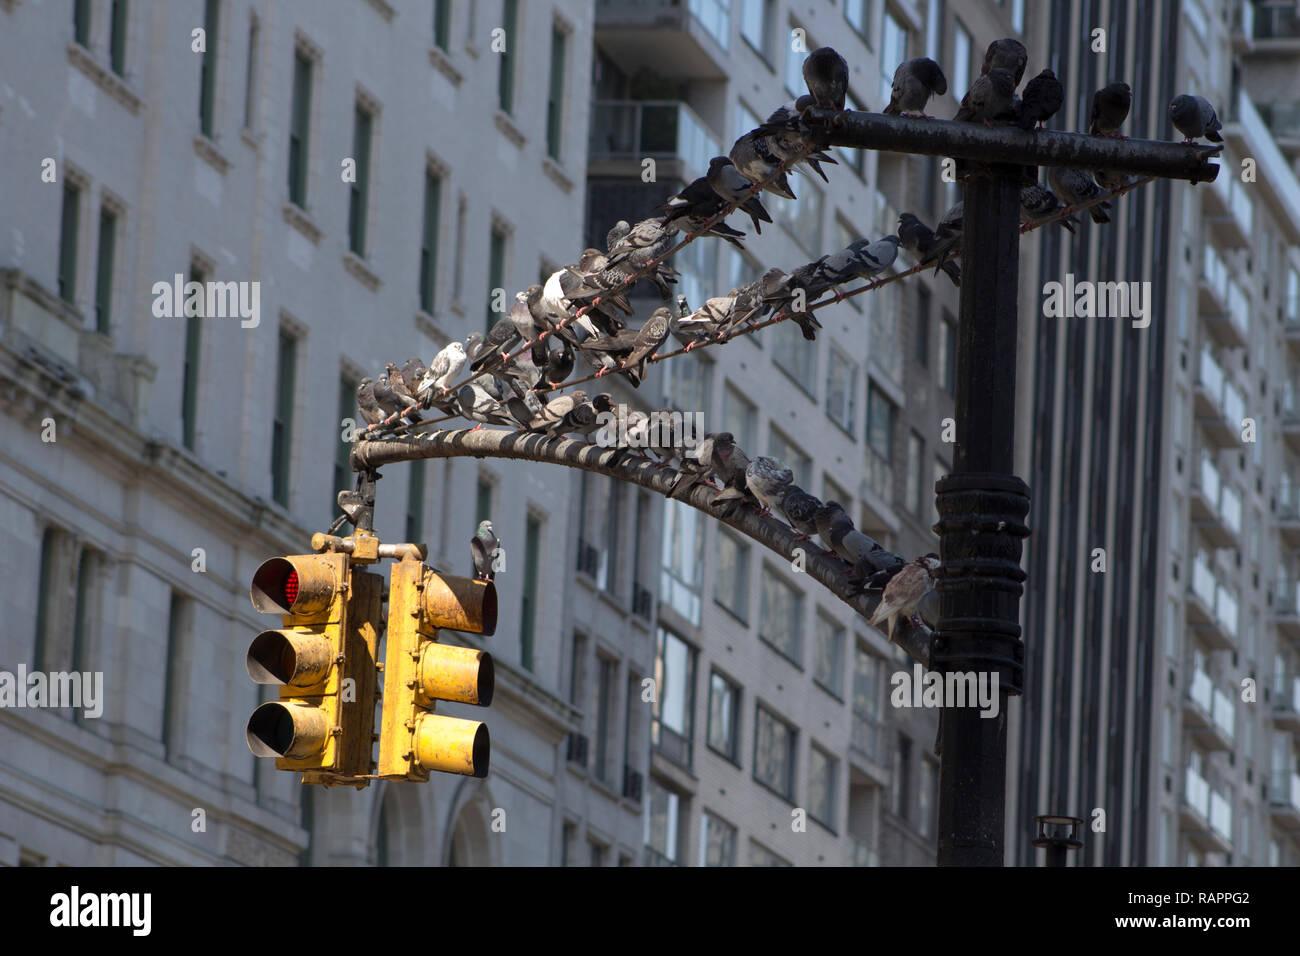 Dozens of pidgeons resrting on the traffic light in New York City - Stock Image